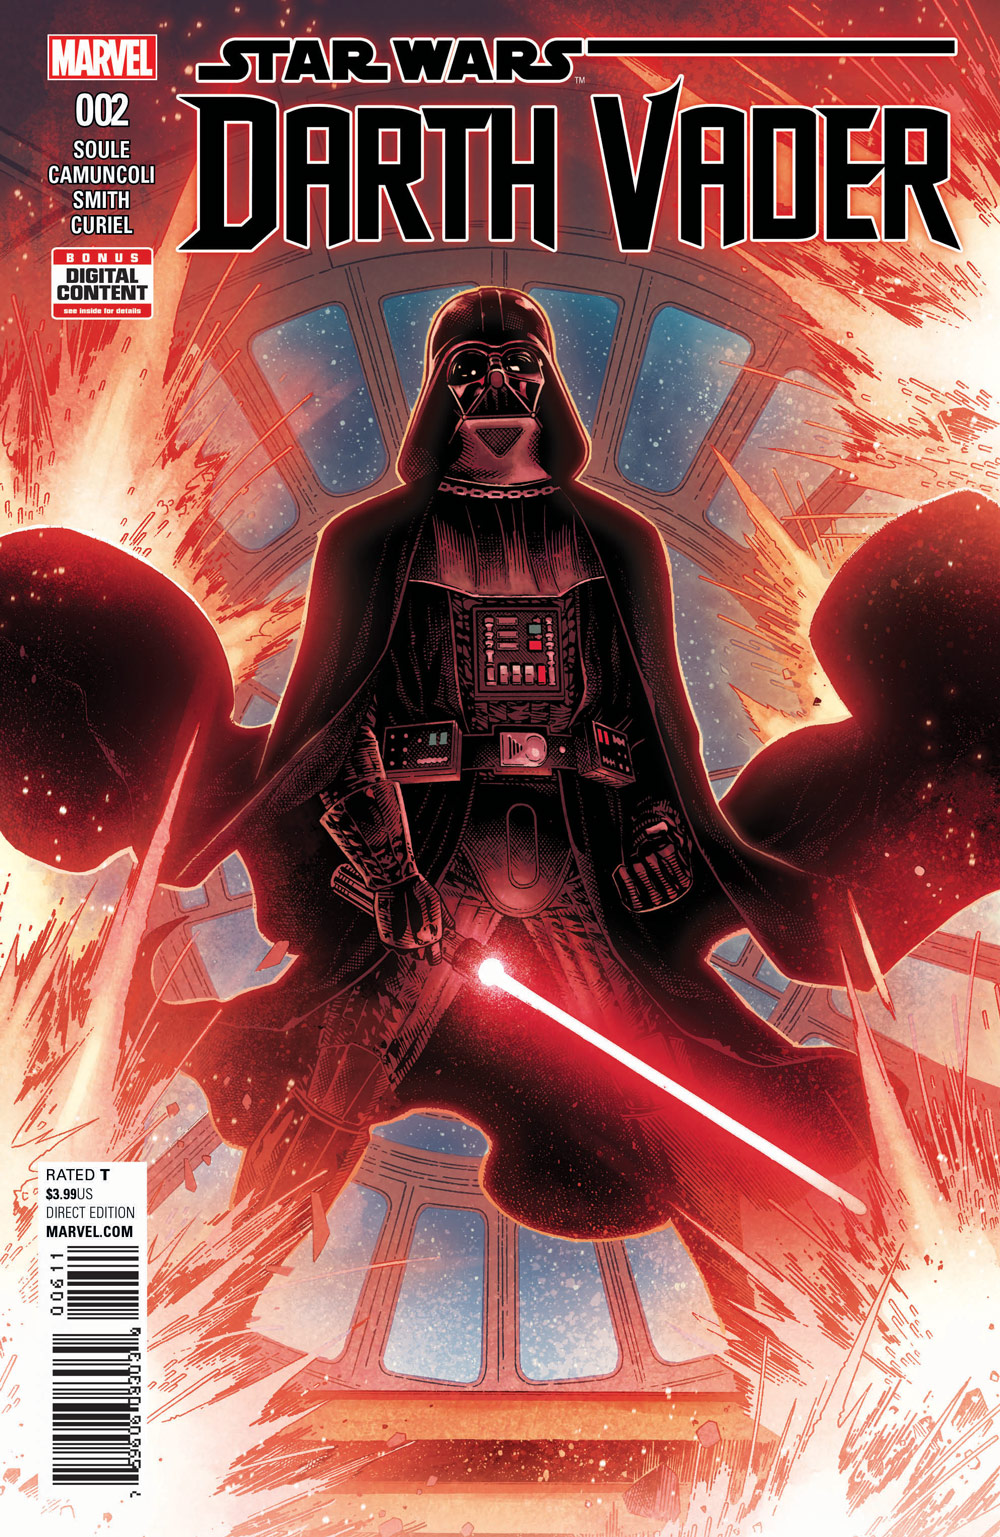 Star Wars Book Cover Art : Star wars borg